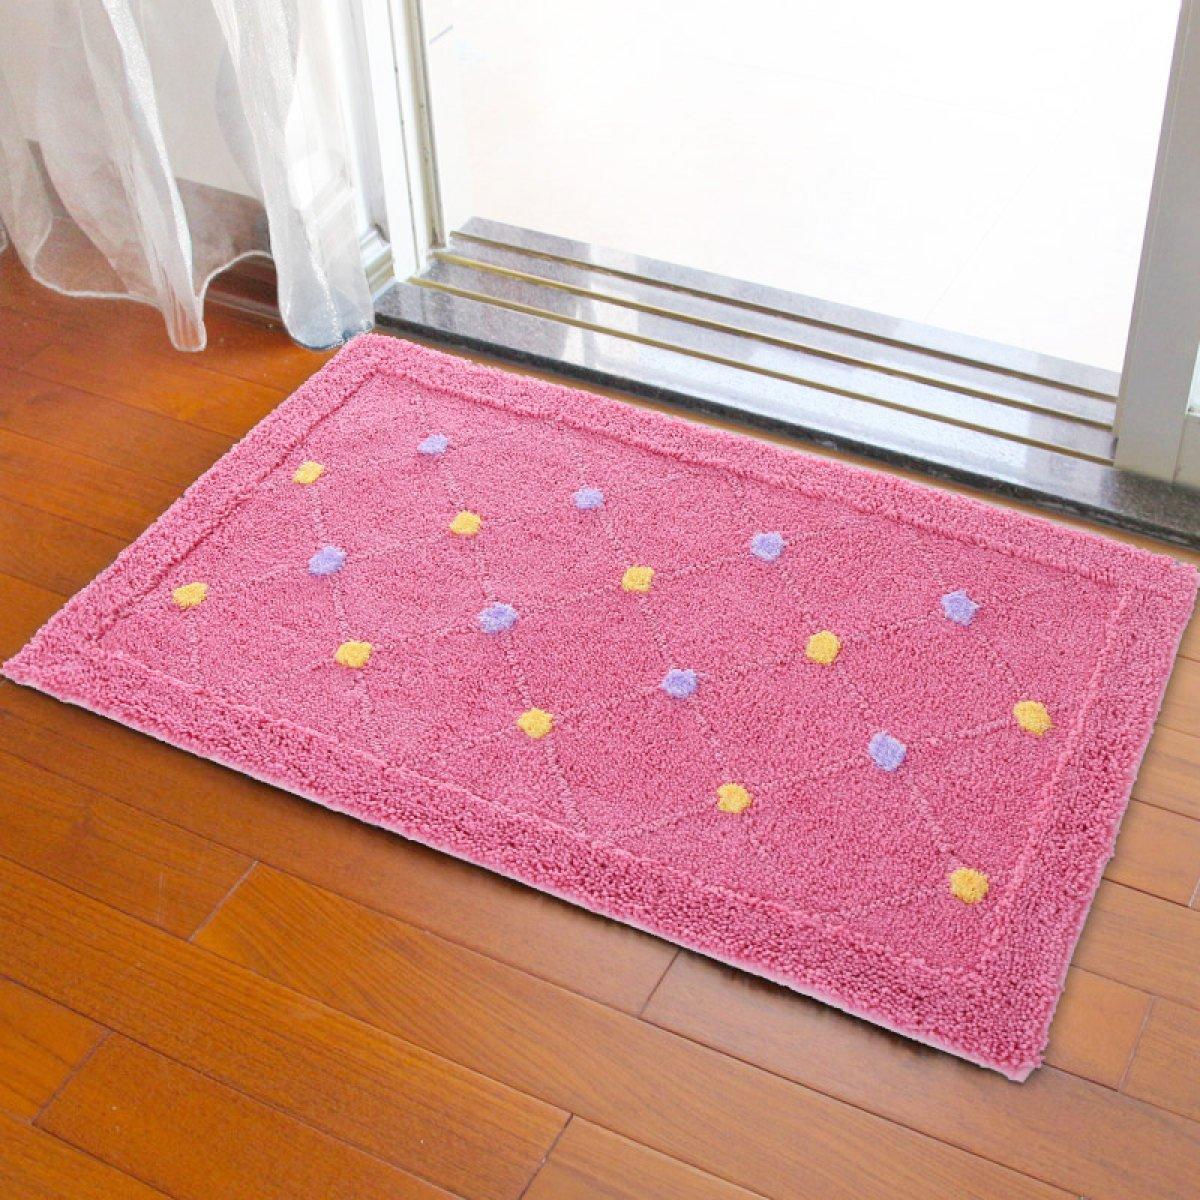 A2 45×65cm Non-Slip Absorbent Living Room Door Mat Kitchen Door Mat Pad Carpet Mat,A3-50×80cm